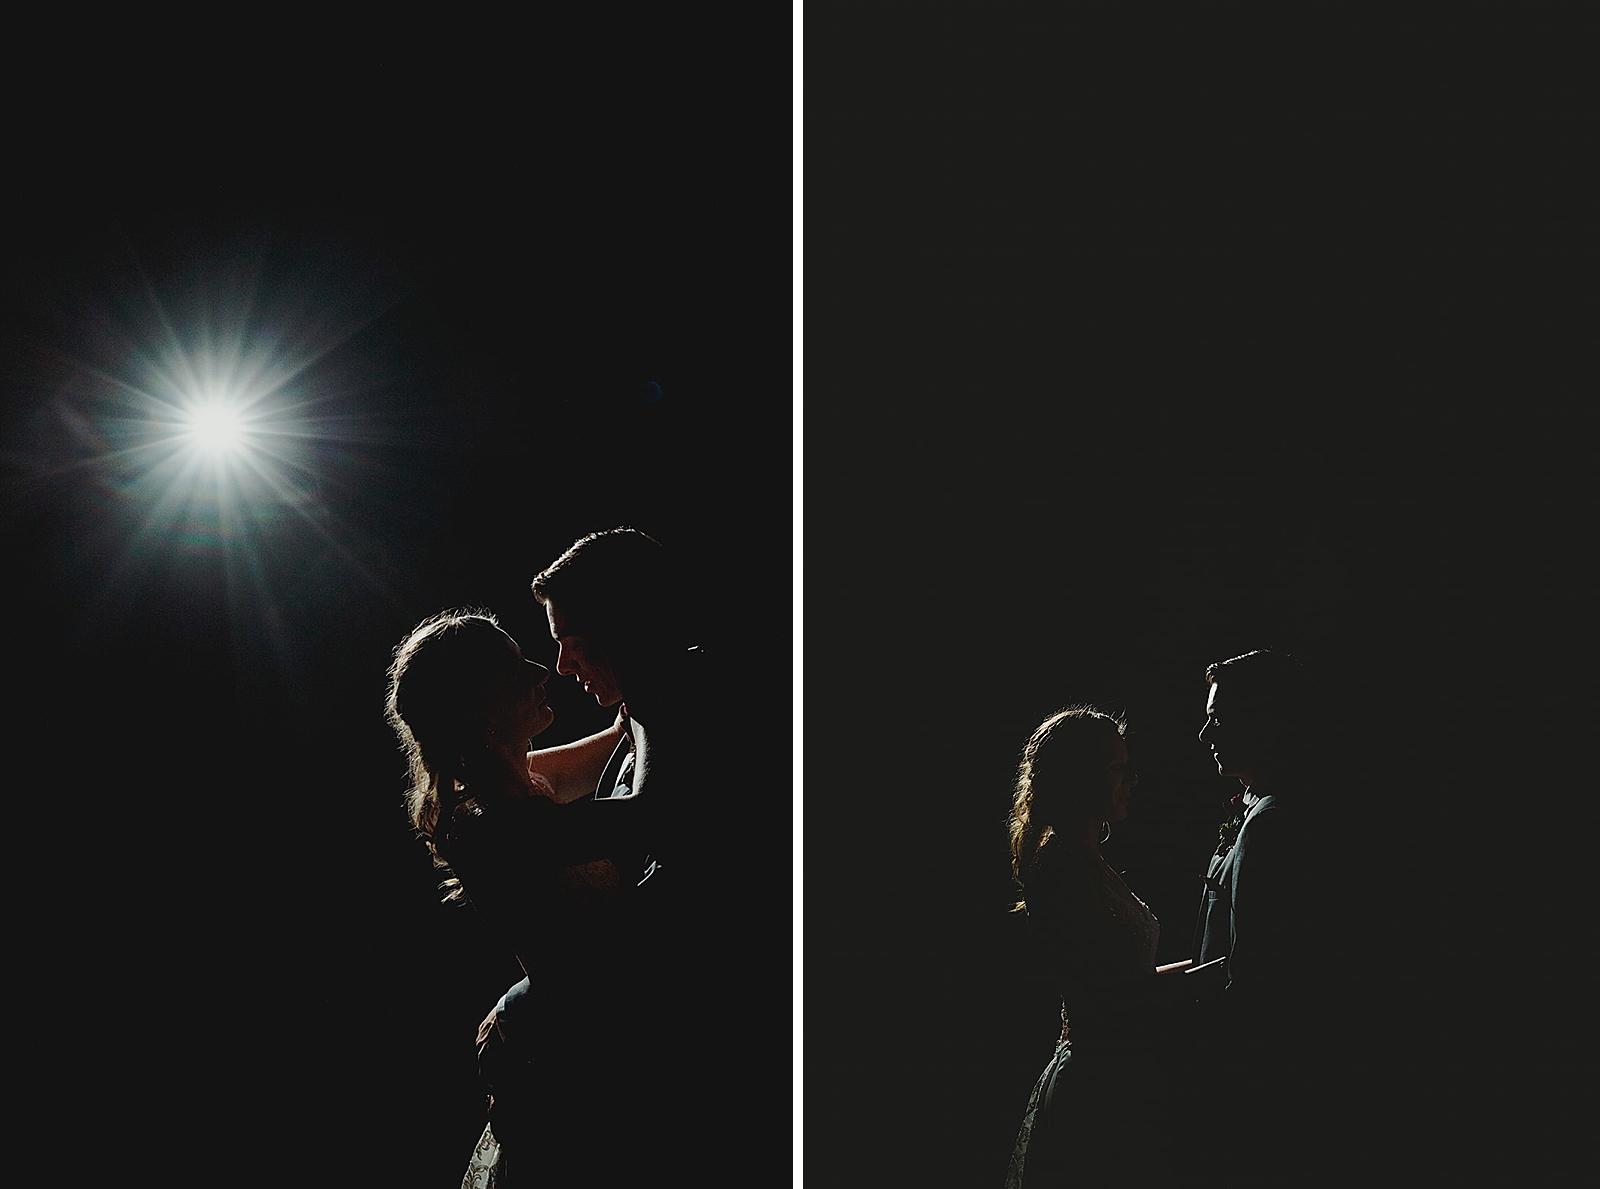 Breckenridge Nordic Center, Breckenridge Nordic Center wedding, Breckenridge Wedding, Breckenridge wedding photographer, Castle Marne, Colorado on Sepetmber 27th, Colorado wedding photographer, Coulder Colorado wedding, Denver Colorado, Denver Colorado wedding Photographer, Denver wedding, Denver wedding photographer, Rocky Mountain wedding photographer, Wedding at the Breckenridge Nordic Center, destination wedding, destination wedding photographer